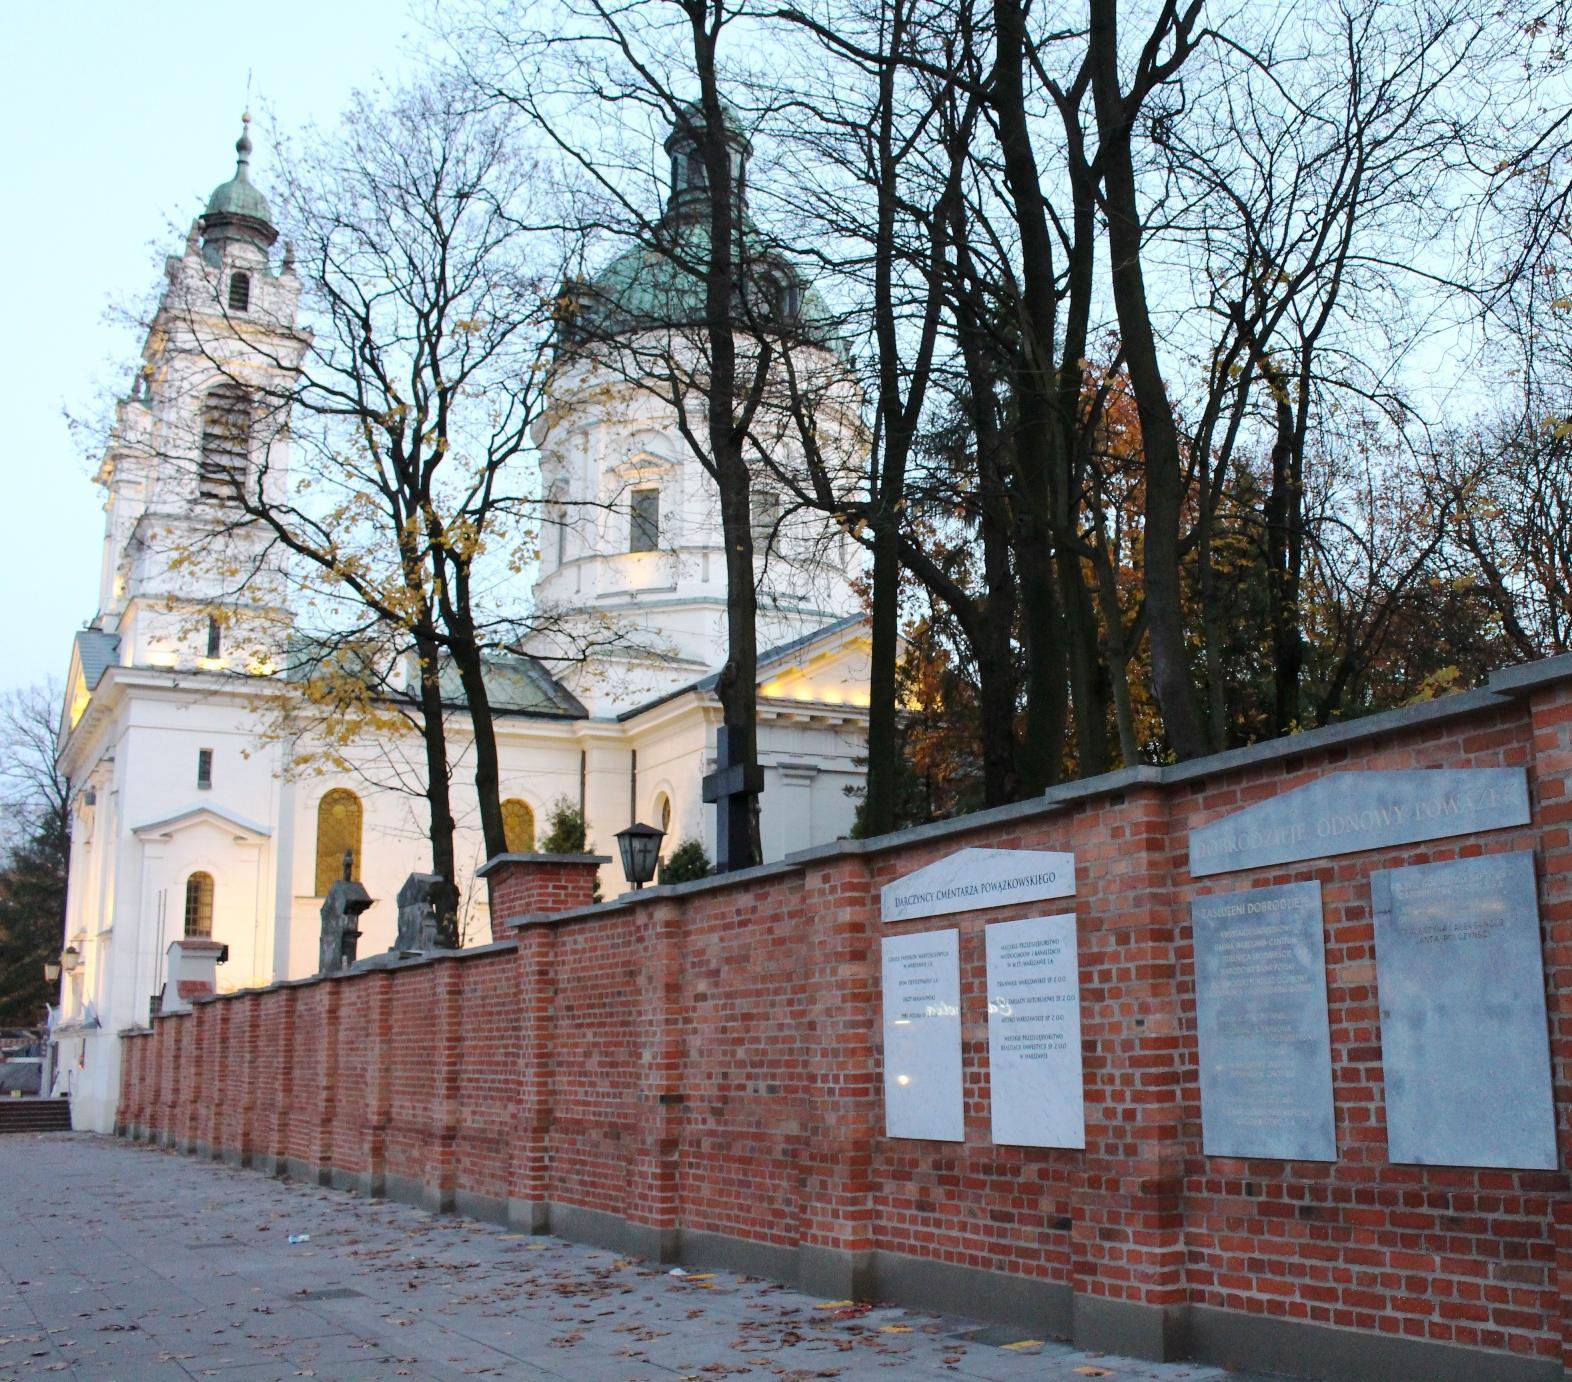 Chiesa cimitero monumentale Powązki